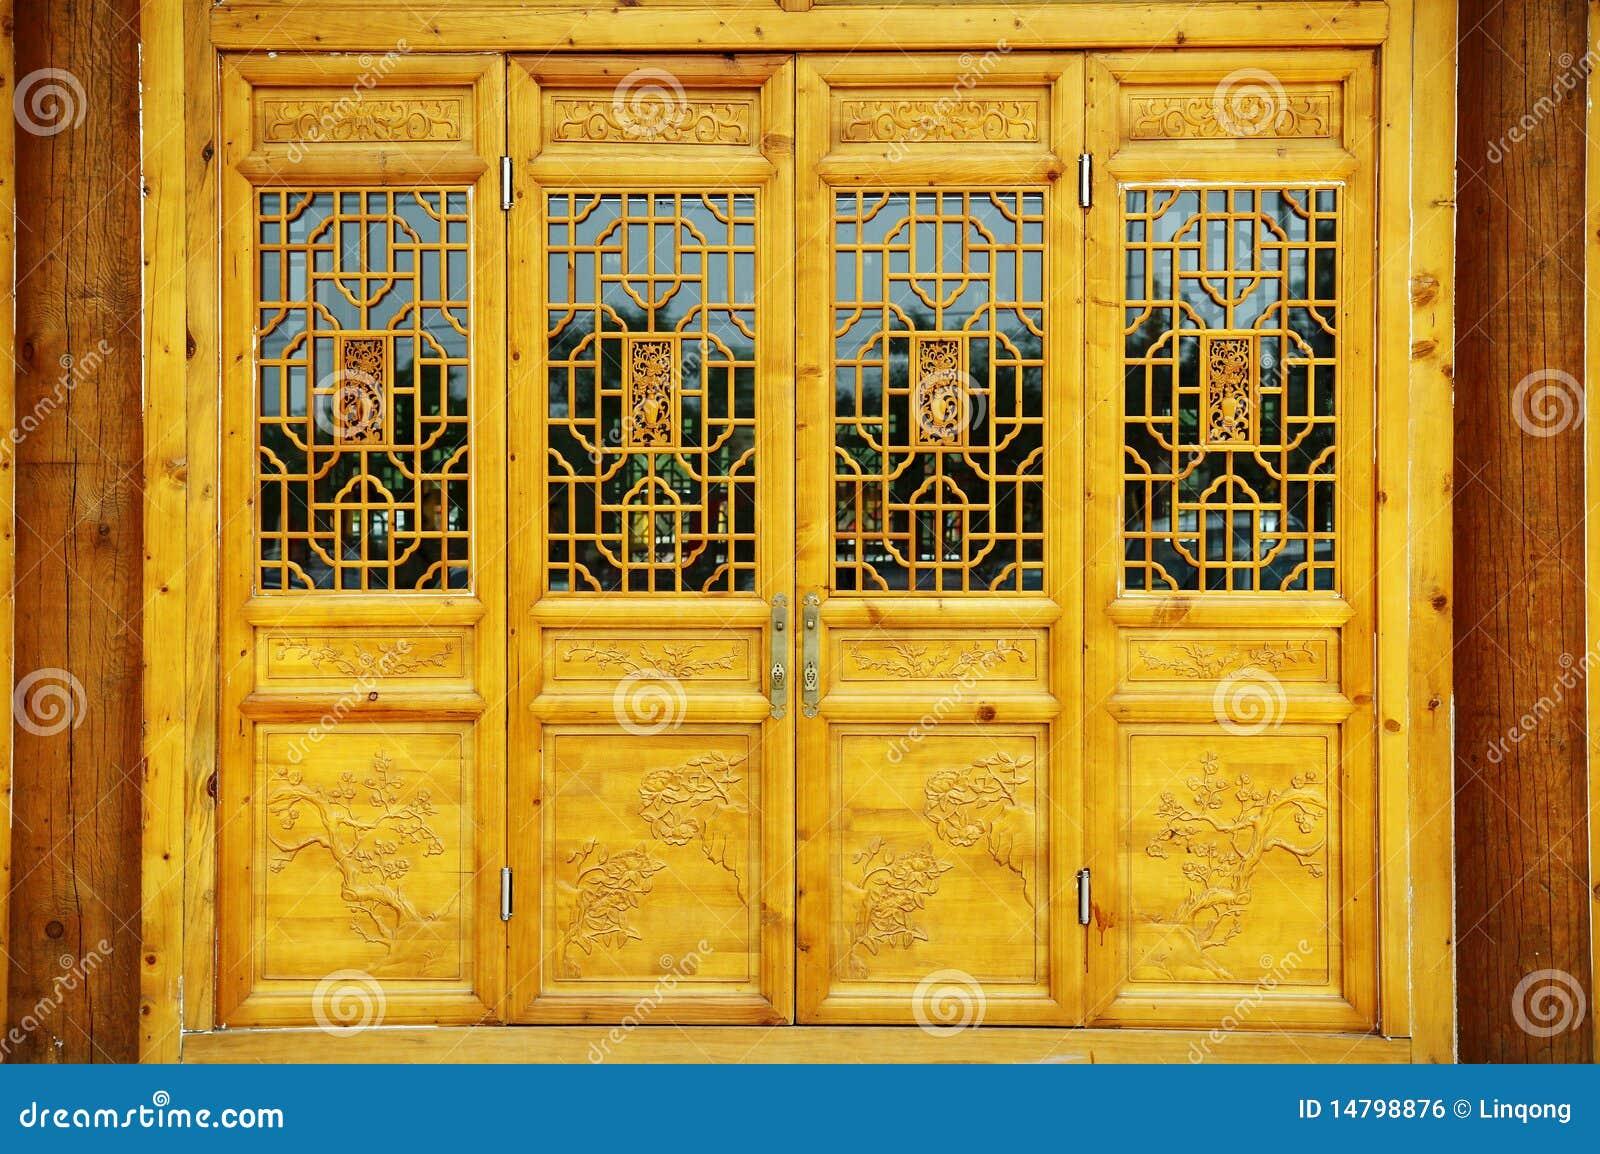 Charmant Chinese Door